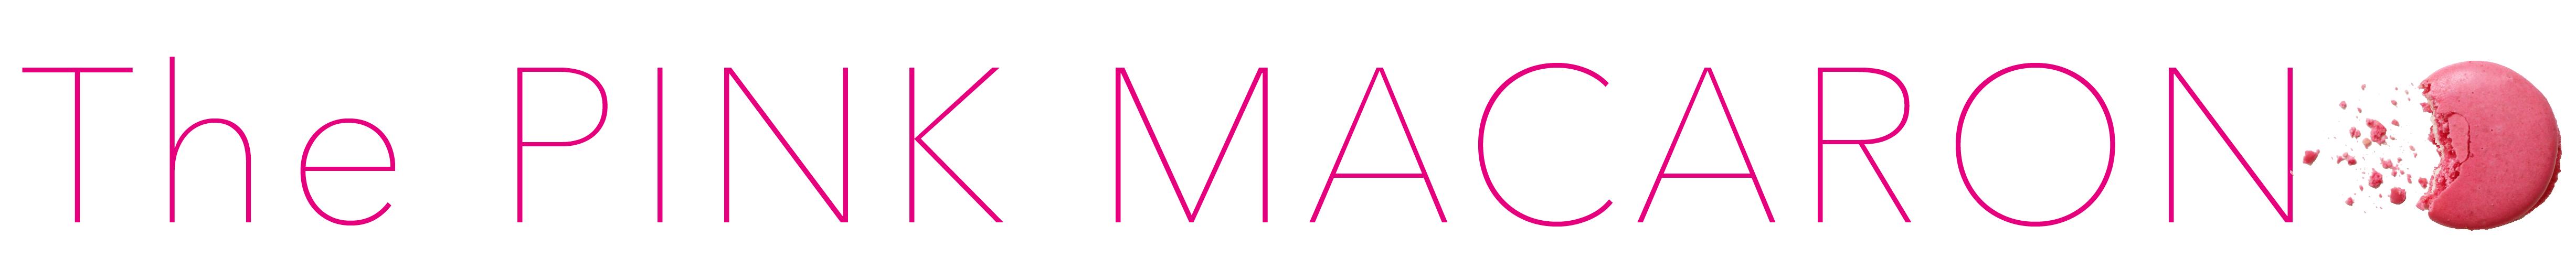 The PINK MACARON - Luxury Fashion & Lifestyle Blog from Munich